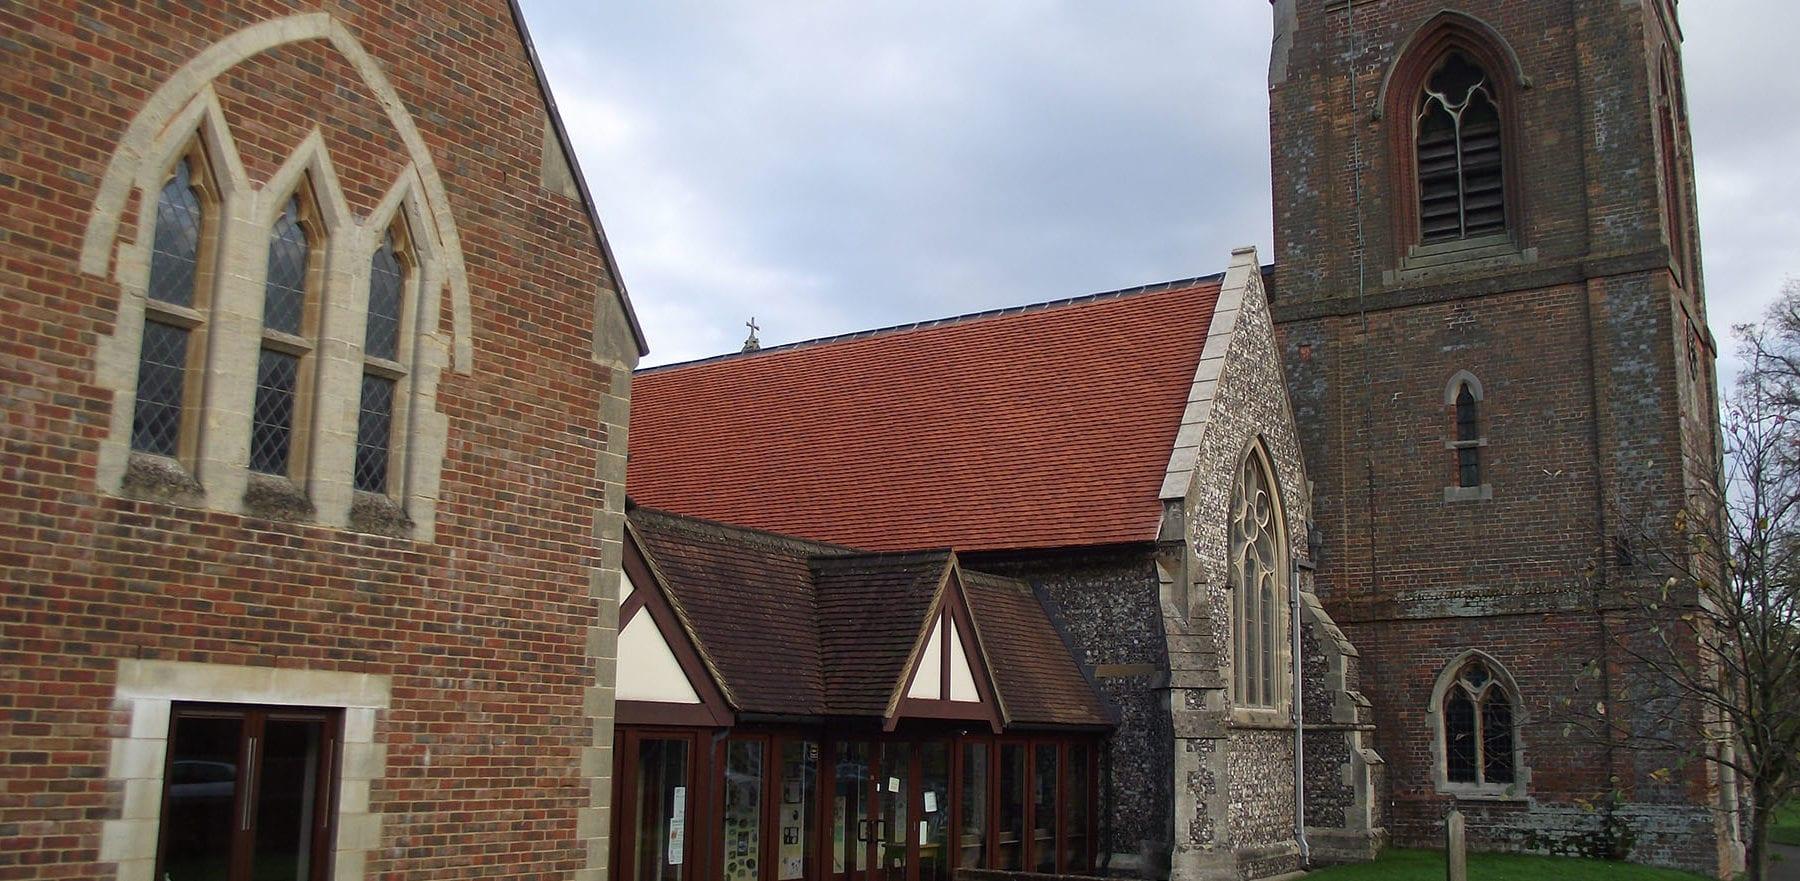 Lifestiles - Handmade Orange Clay Roof Tiles - Berkshire, England 3